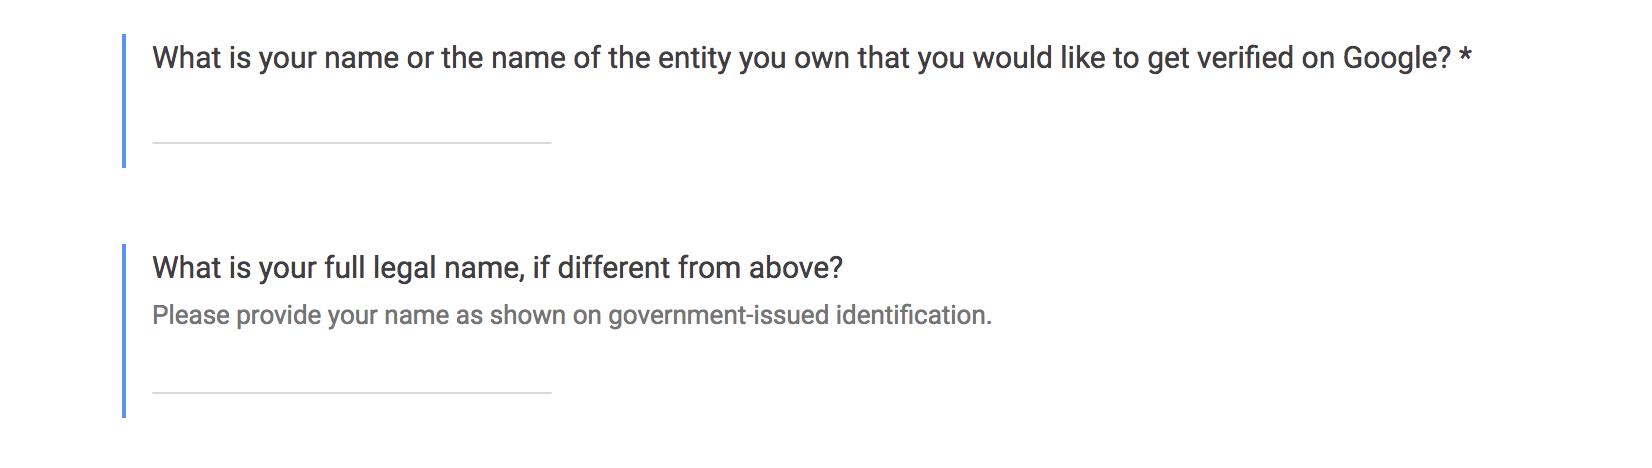 Name details for Google Knowledge Panel Verification